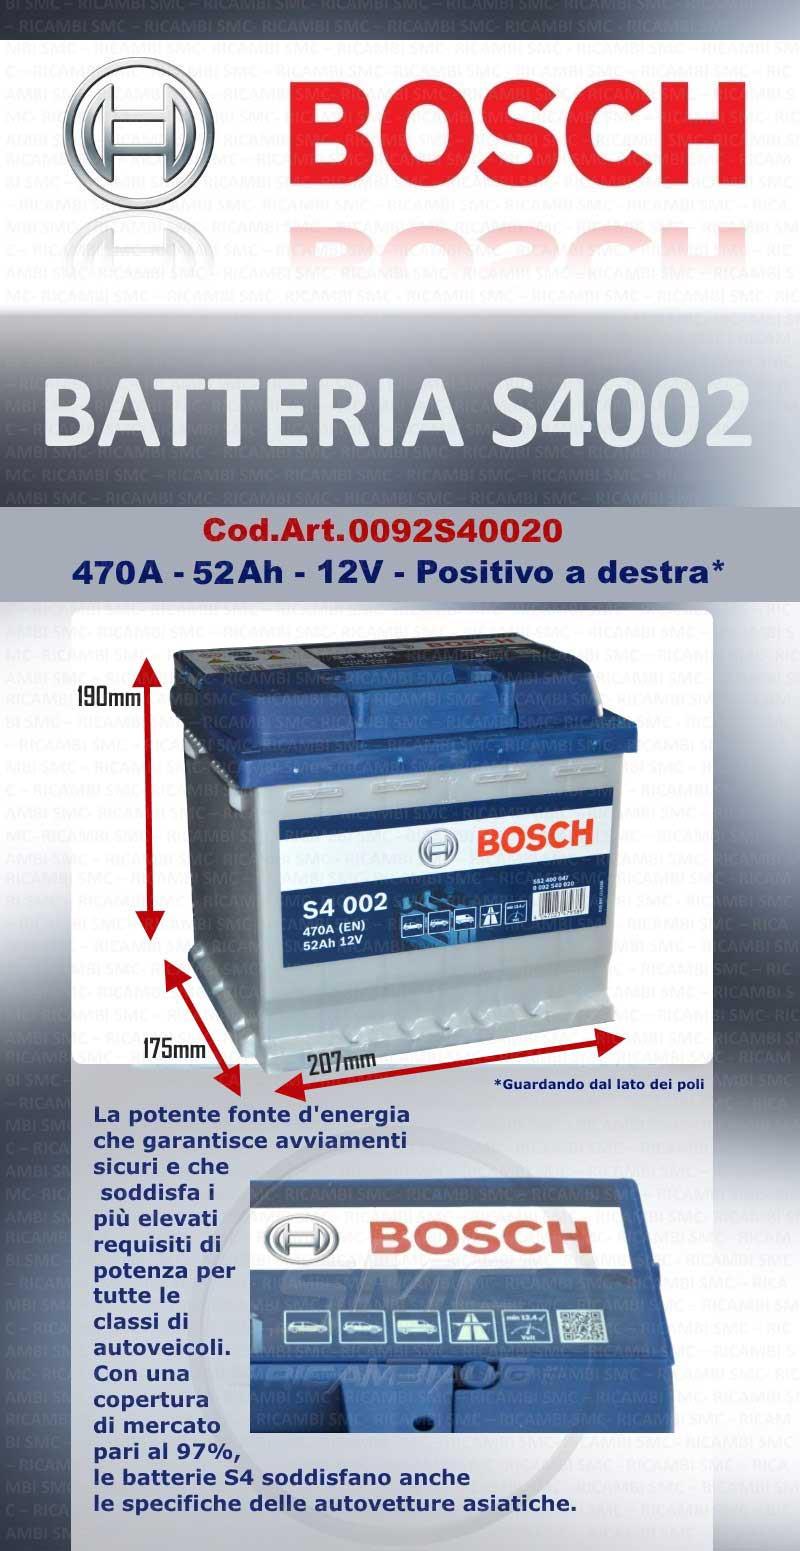 Batteria avviamento bosch 0092s40020 52ah 470a ricambi for Smc ricambi auto